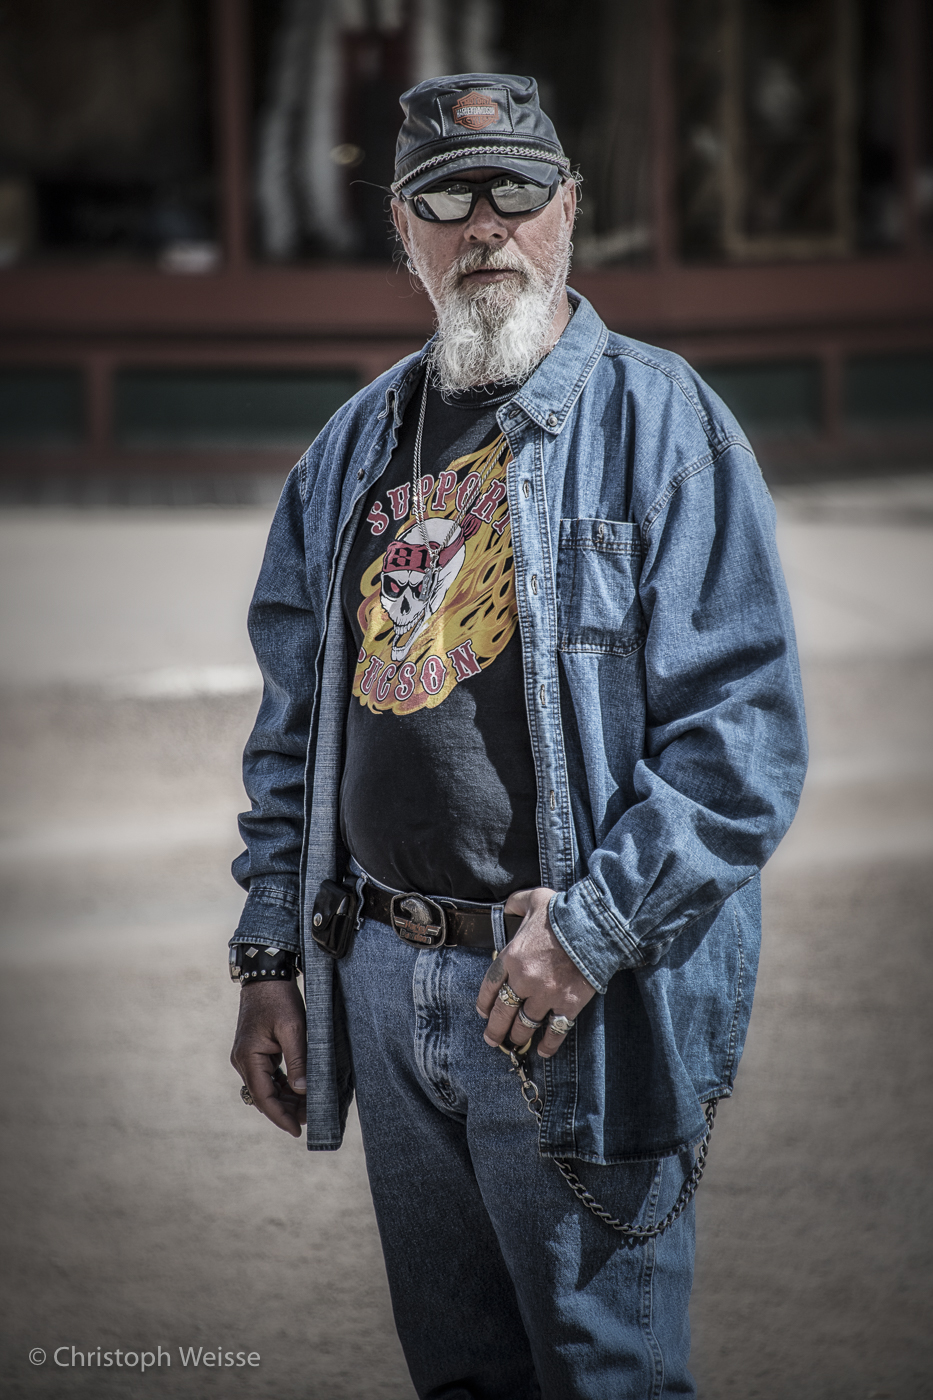 Strassenfotografie-Arizona-ChristophWeisse-4.jpg